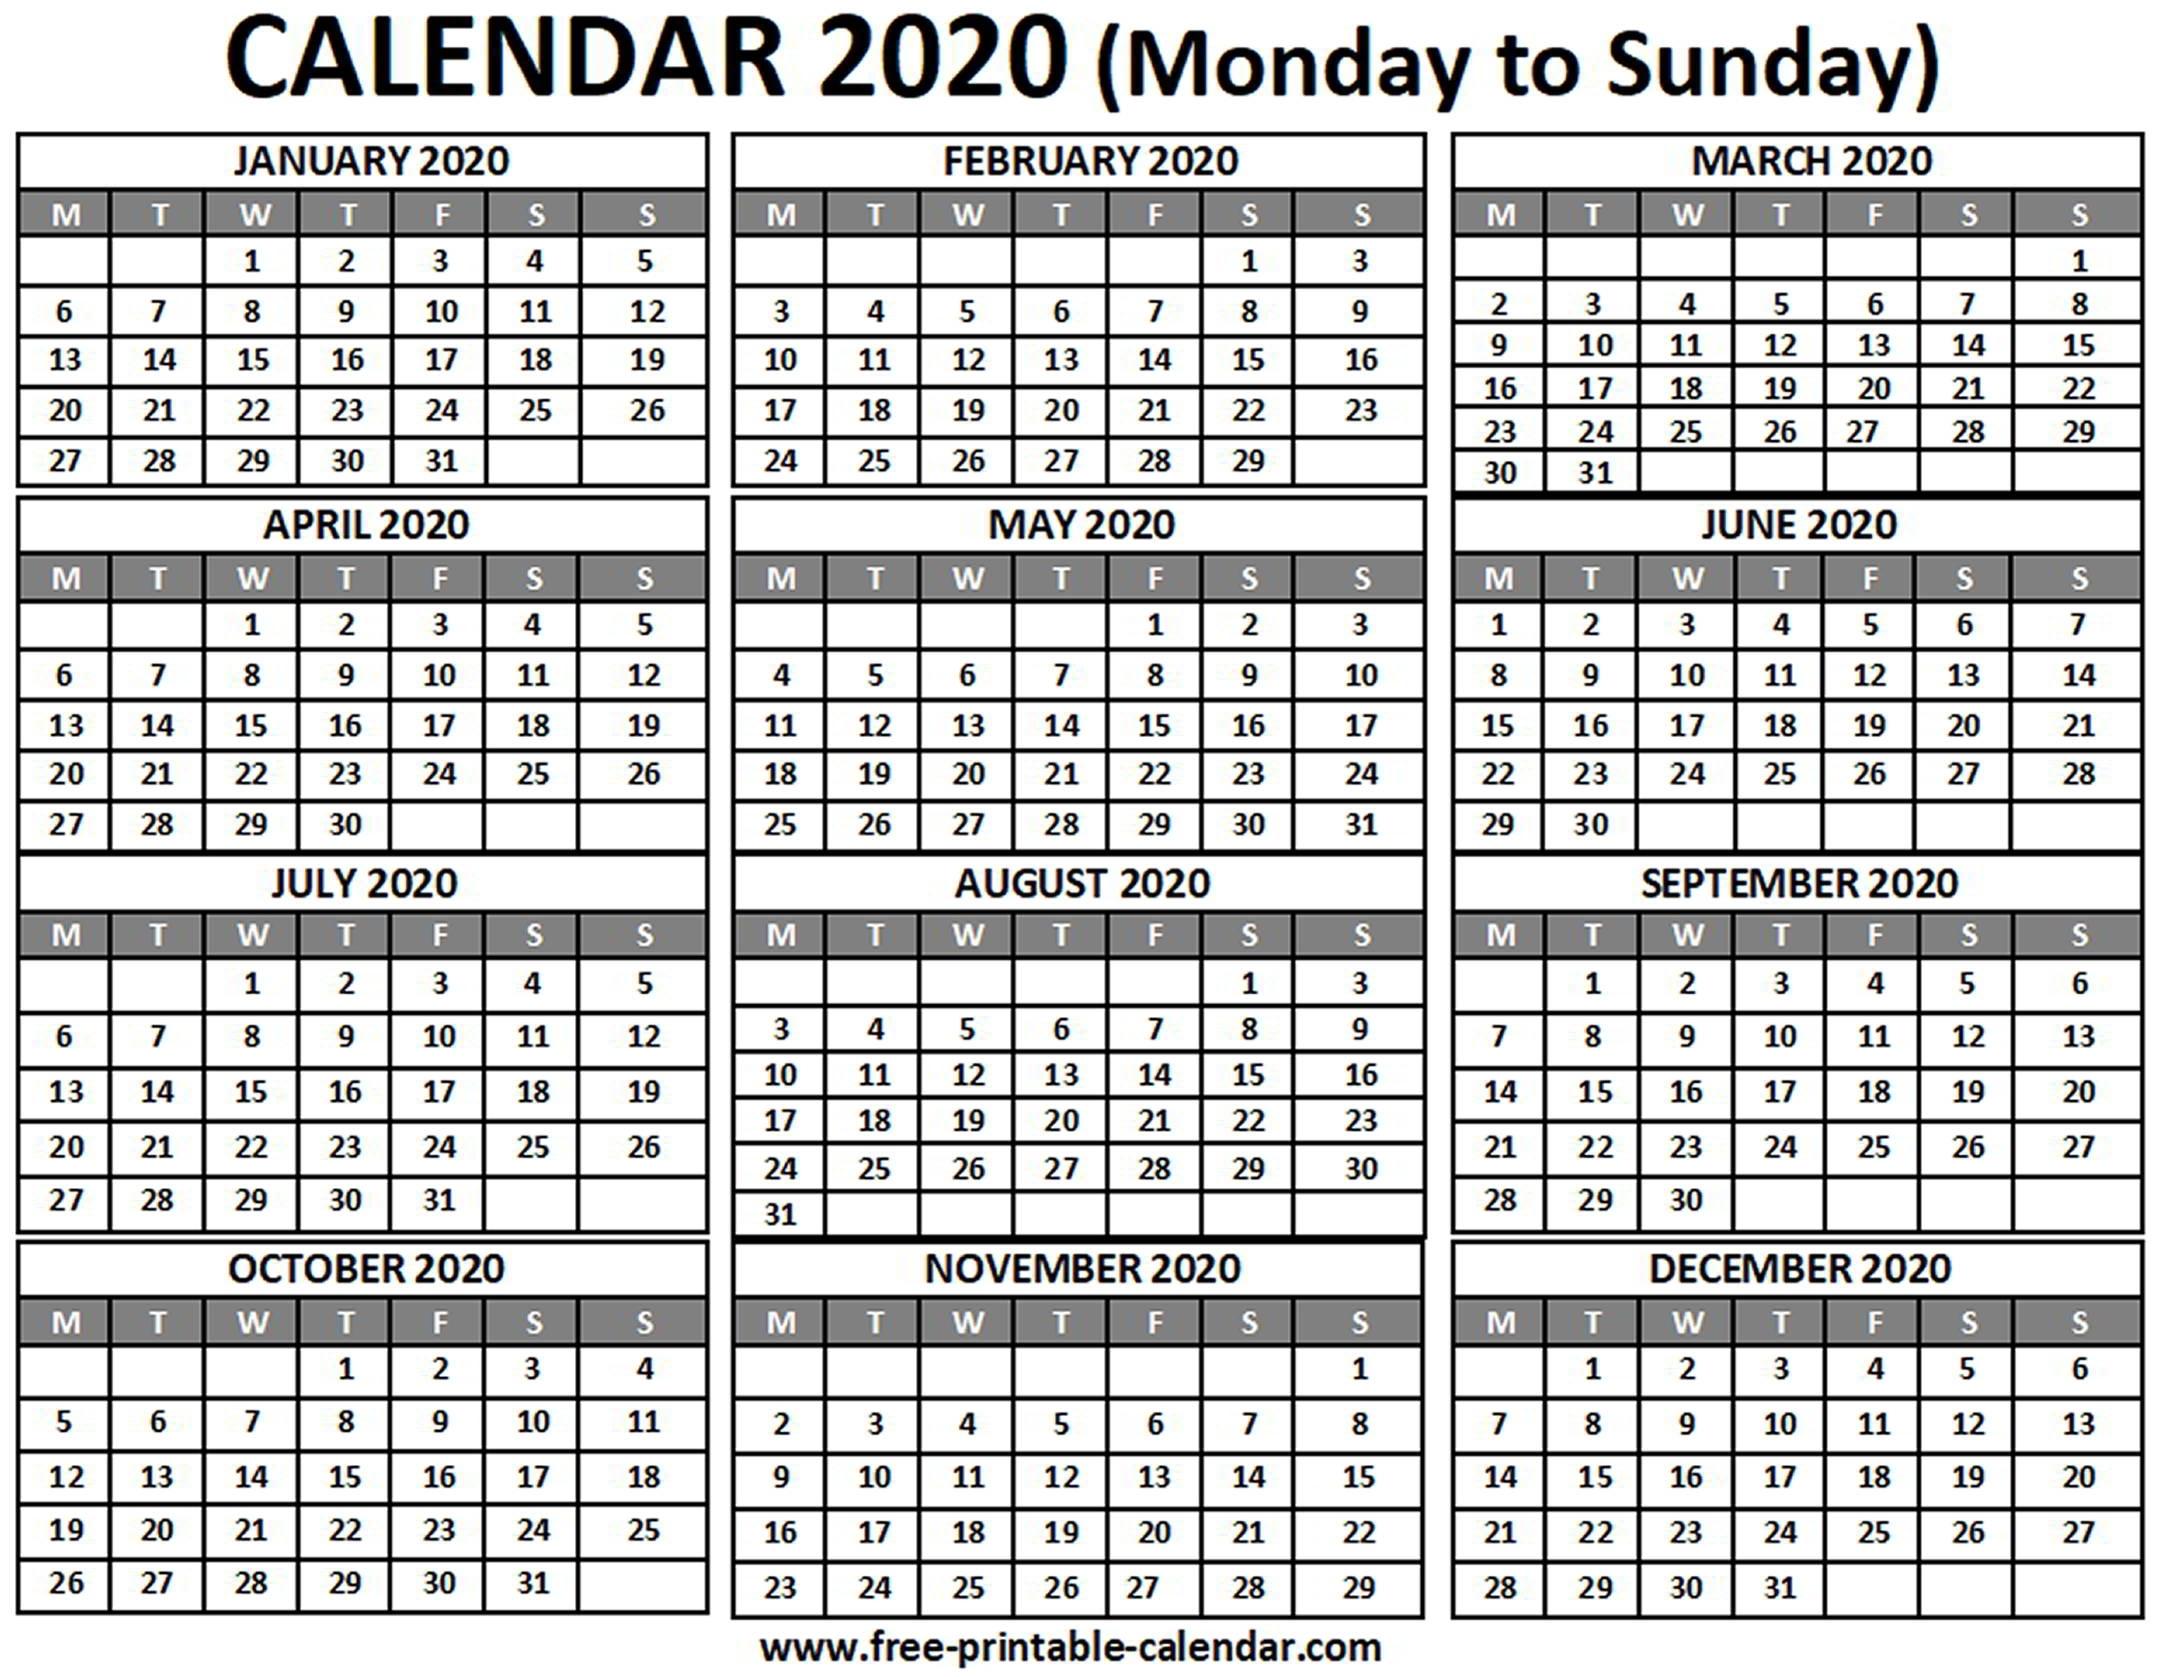 2020 Calendar - Free-Printable-Calendar inside Monday Start Printable Calendar 2020